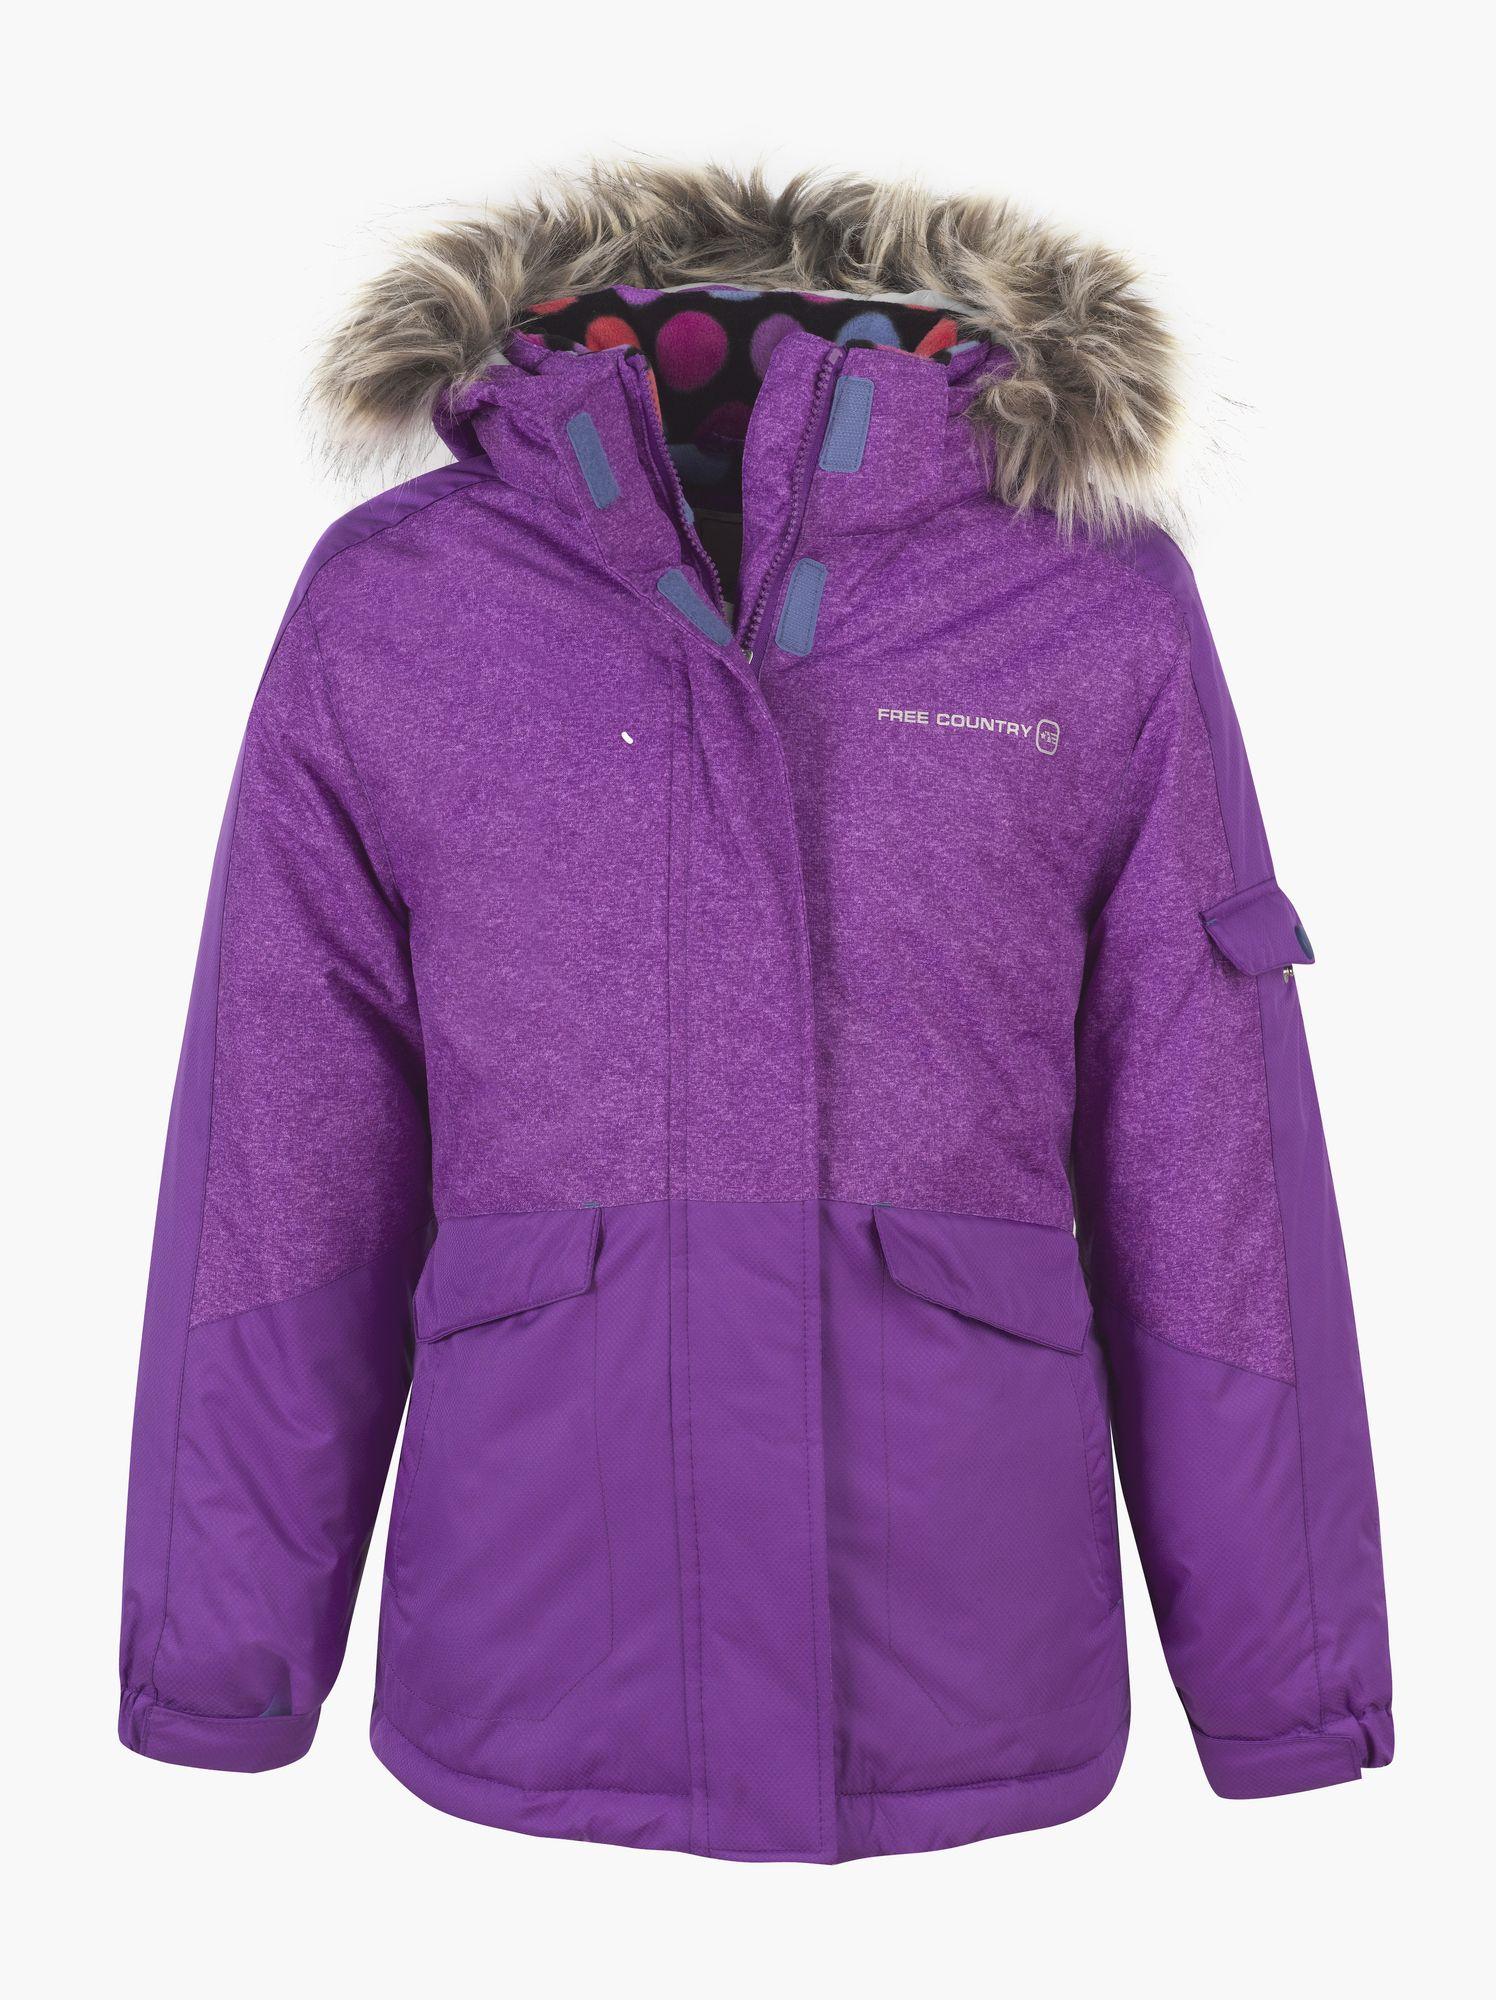 881d3b3e Girls' Gusto Snowboard Jacket - Free Country   Kid Stuff   Jackets ...